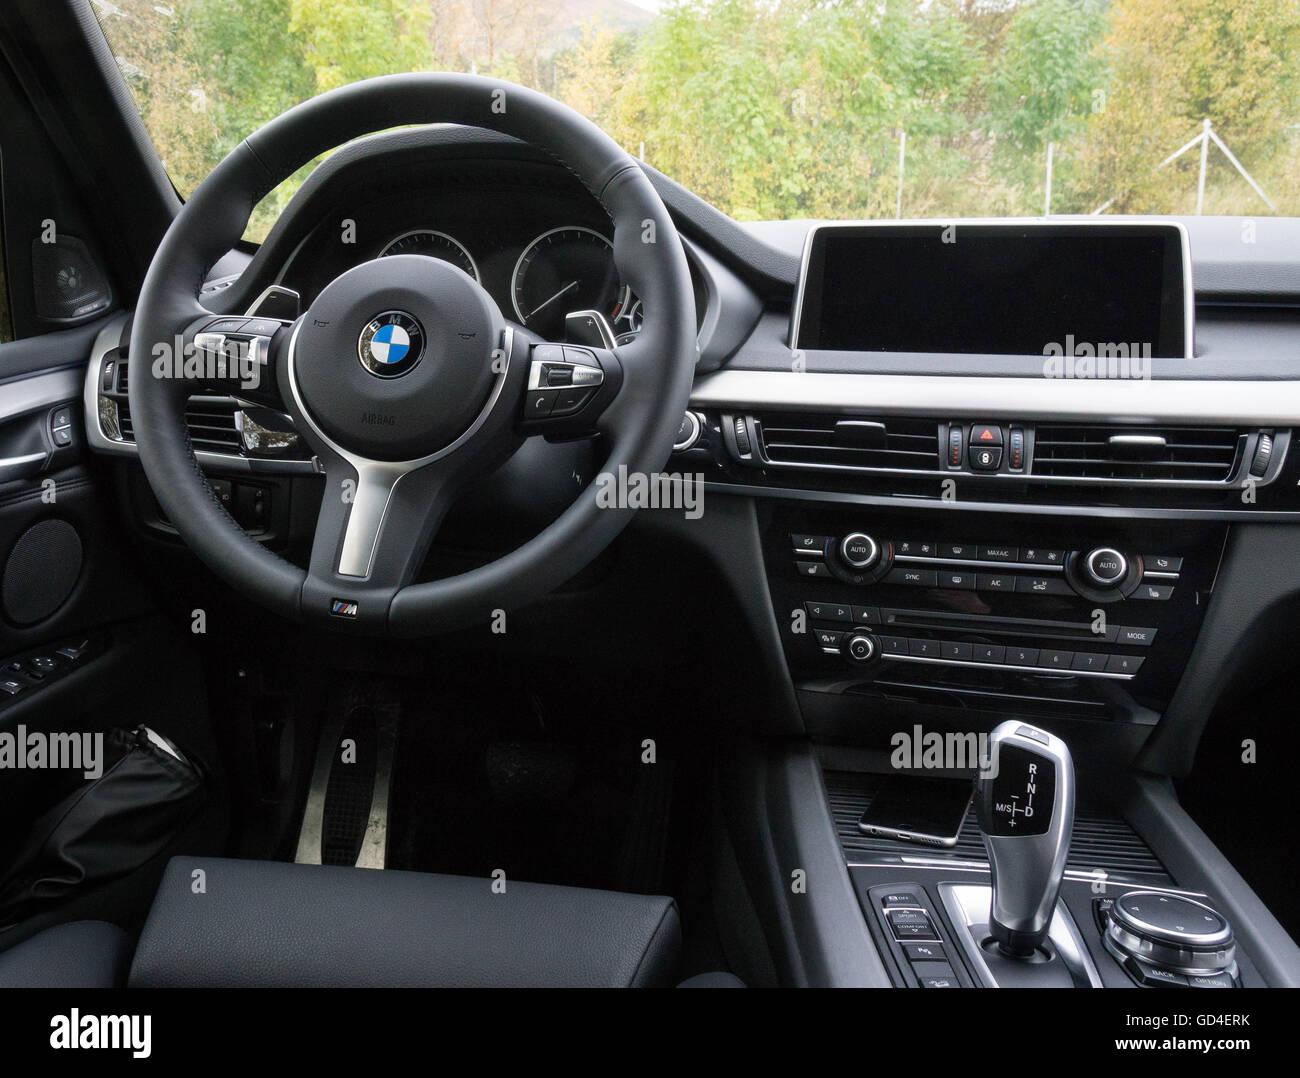 BMW X5 interior - Stock Image